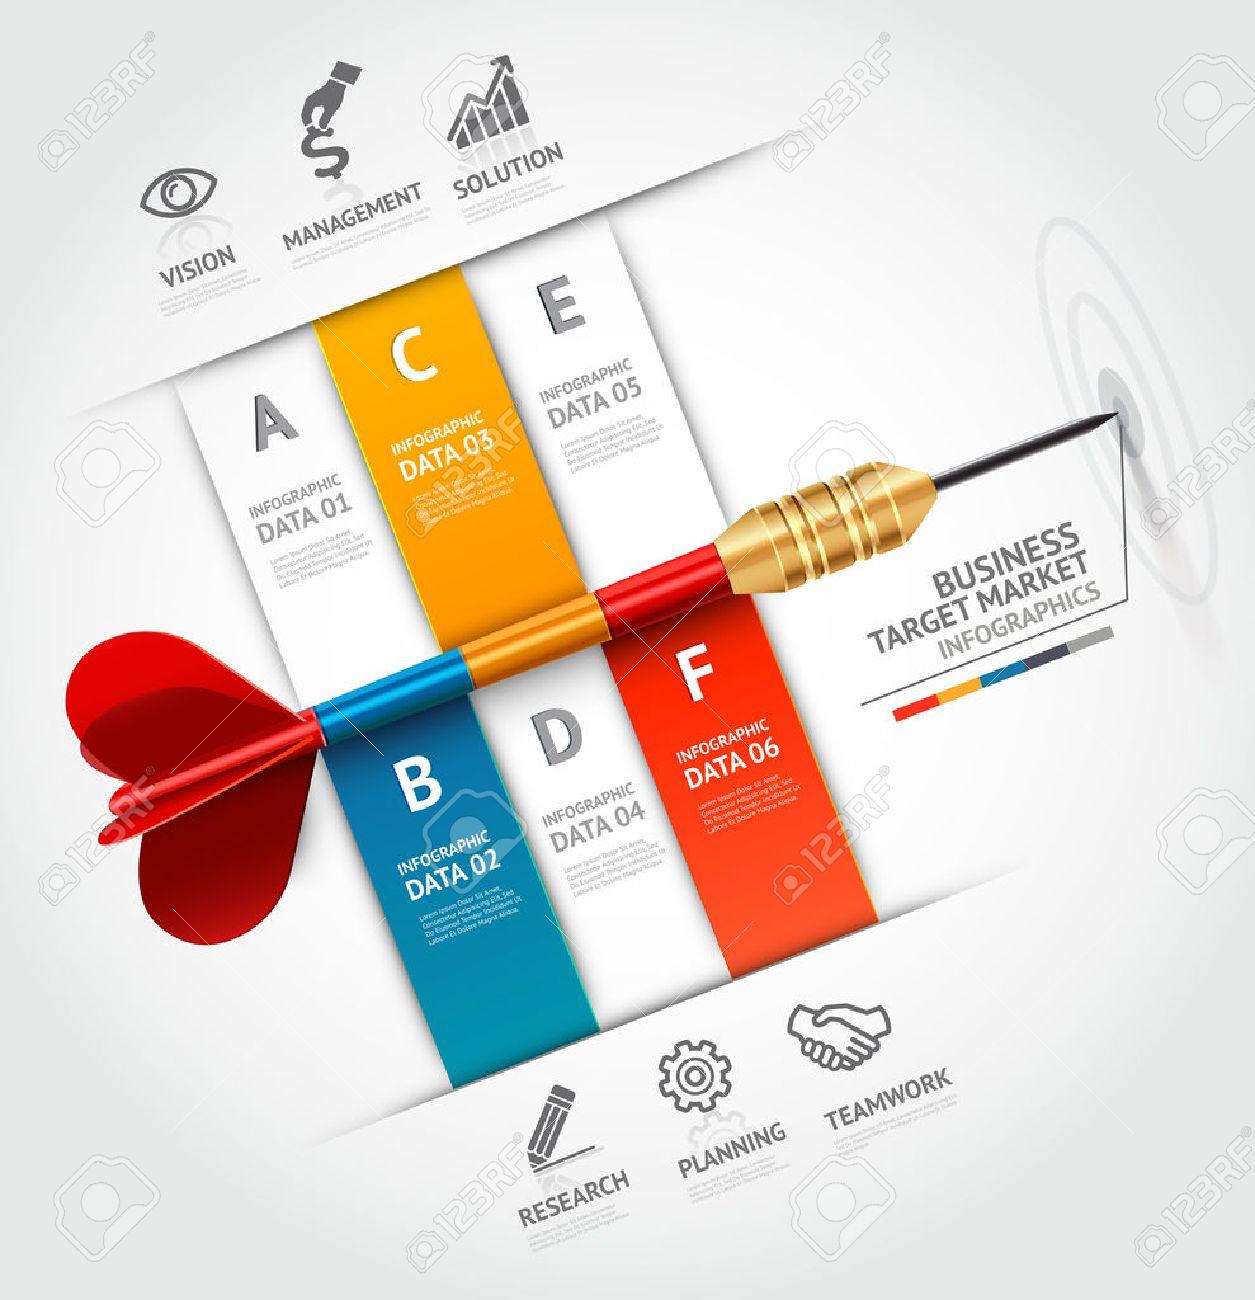 Concepto De Negocio Plantilla De Infografía. Empresas De Marketing ...